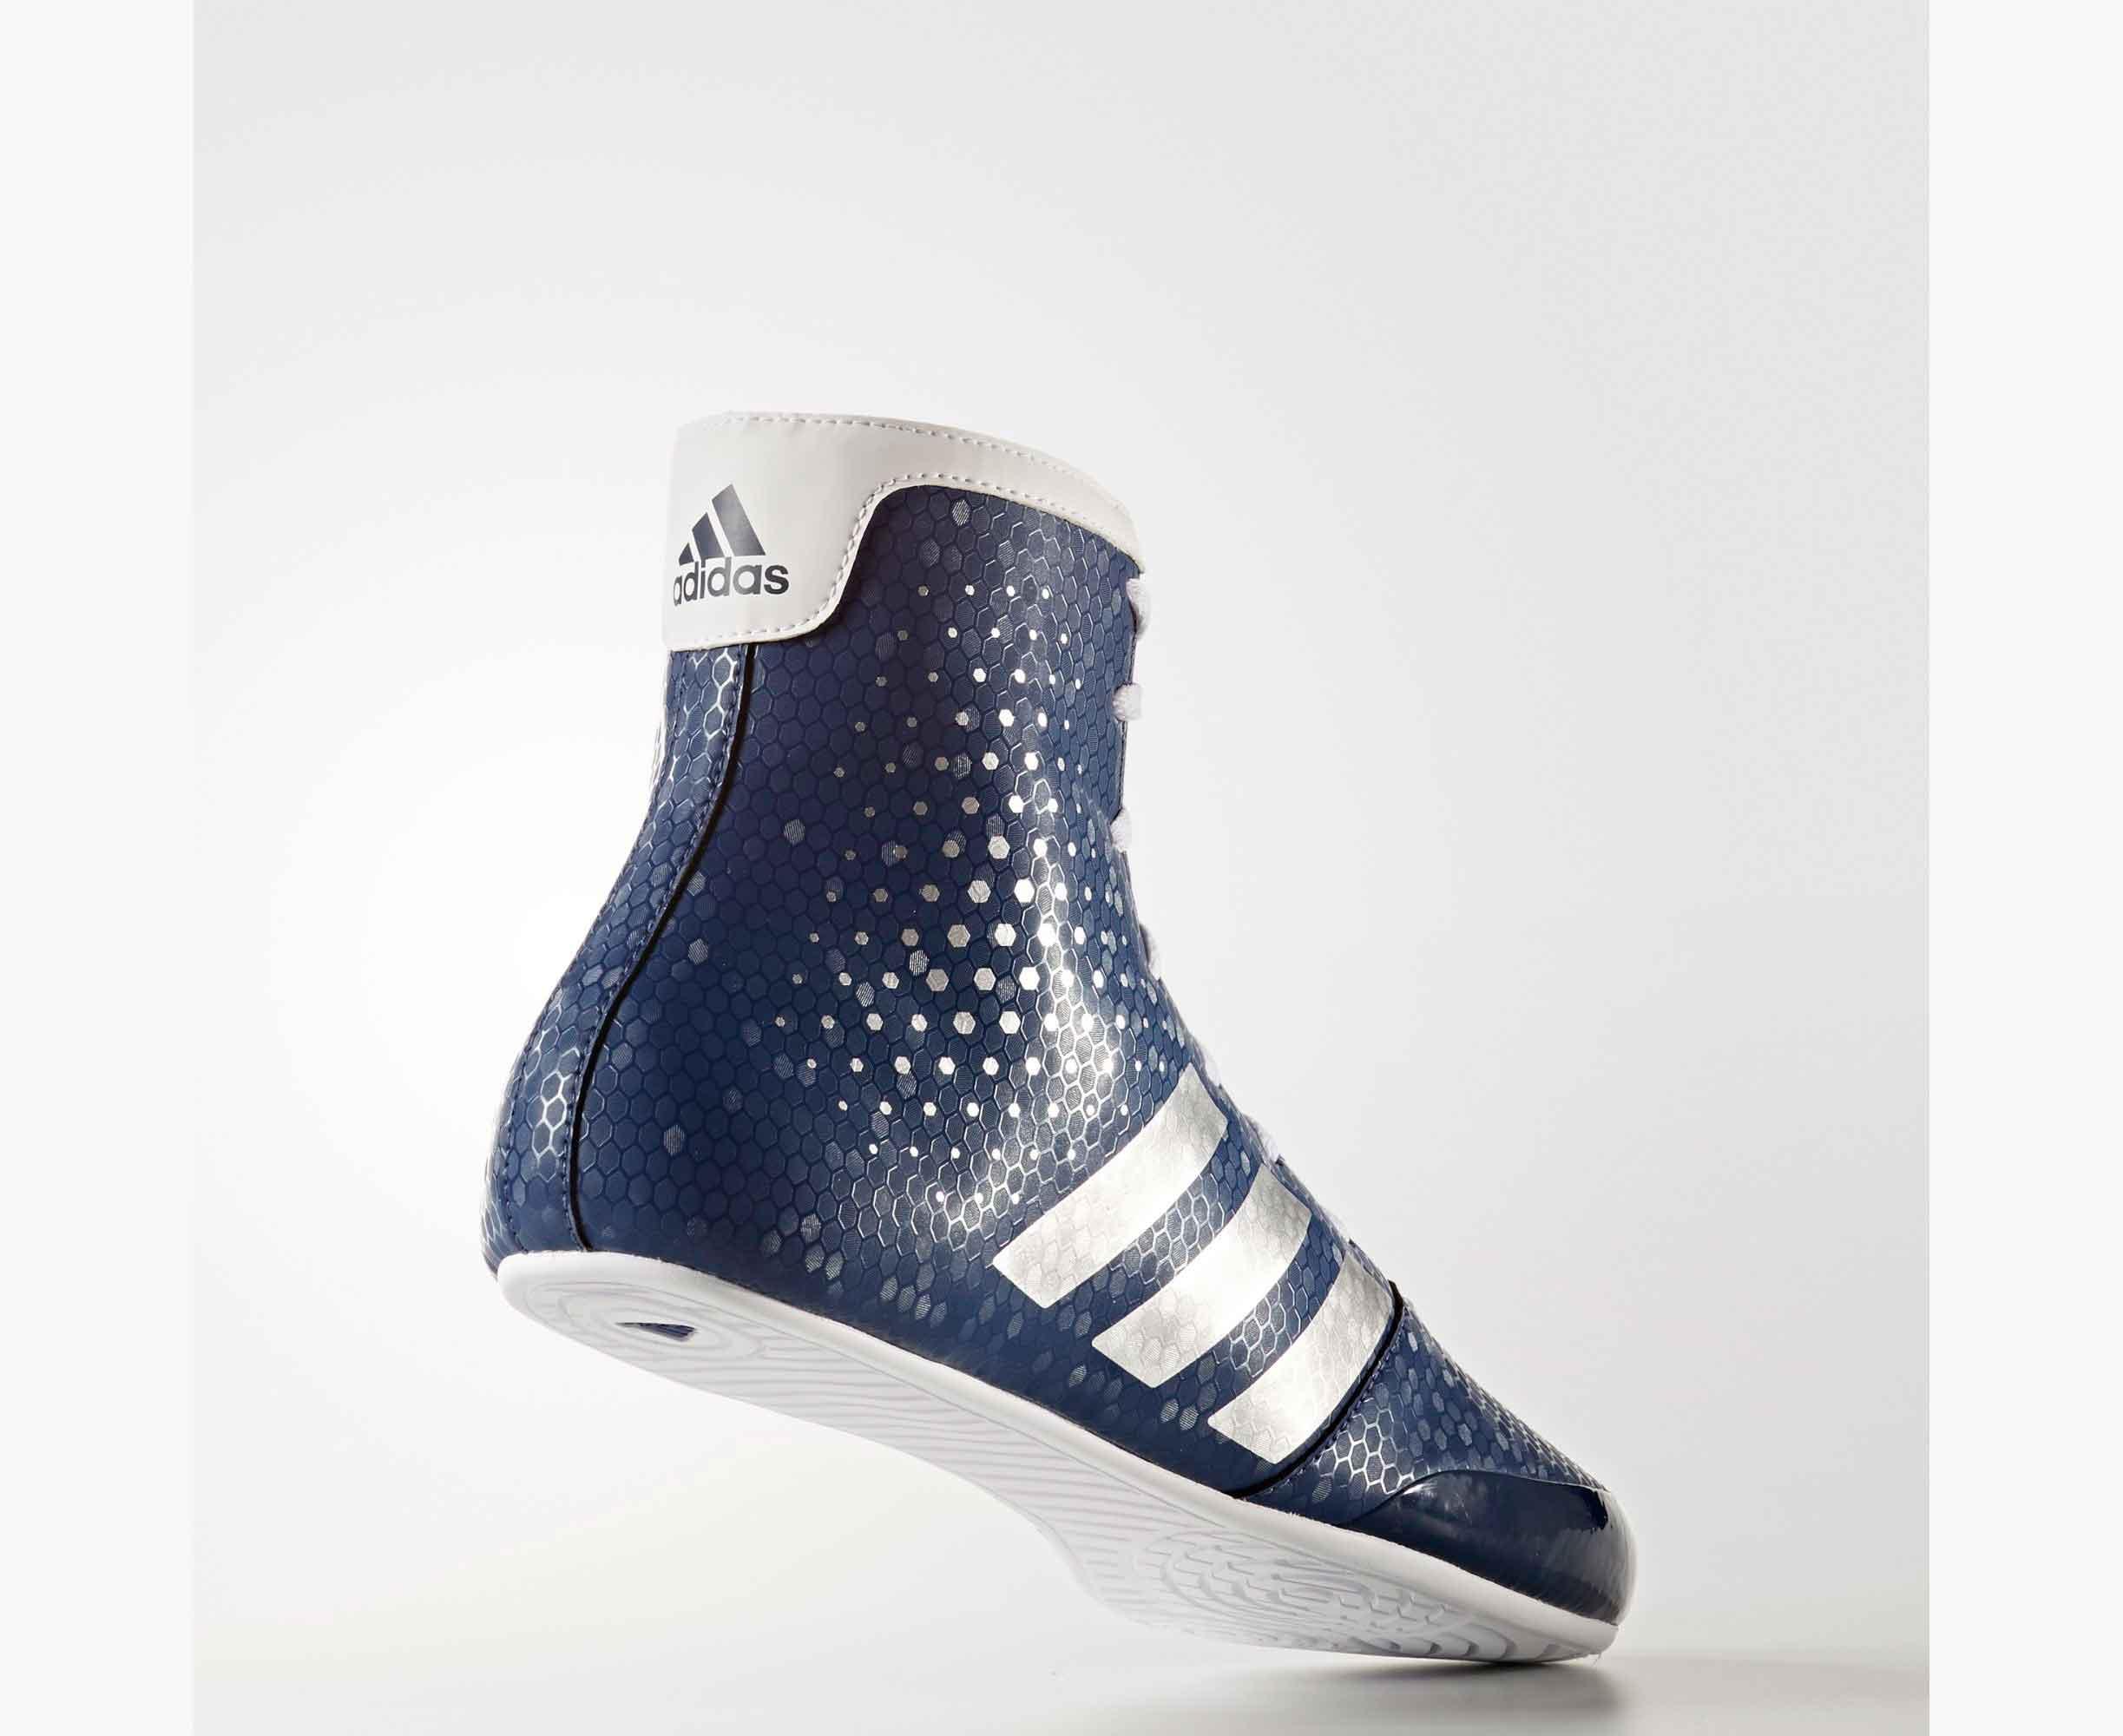 b416b0bbdbbb95 Adidas Боксерки KO Legend 16.2 купить в магазине Все для бокса и единоборств